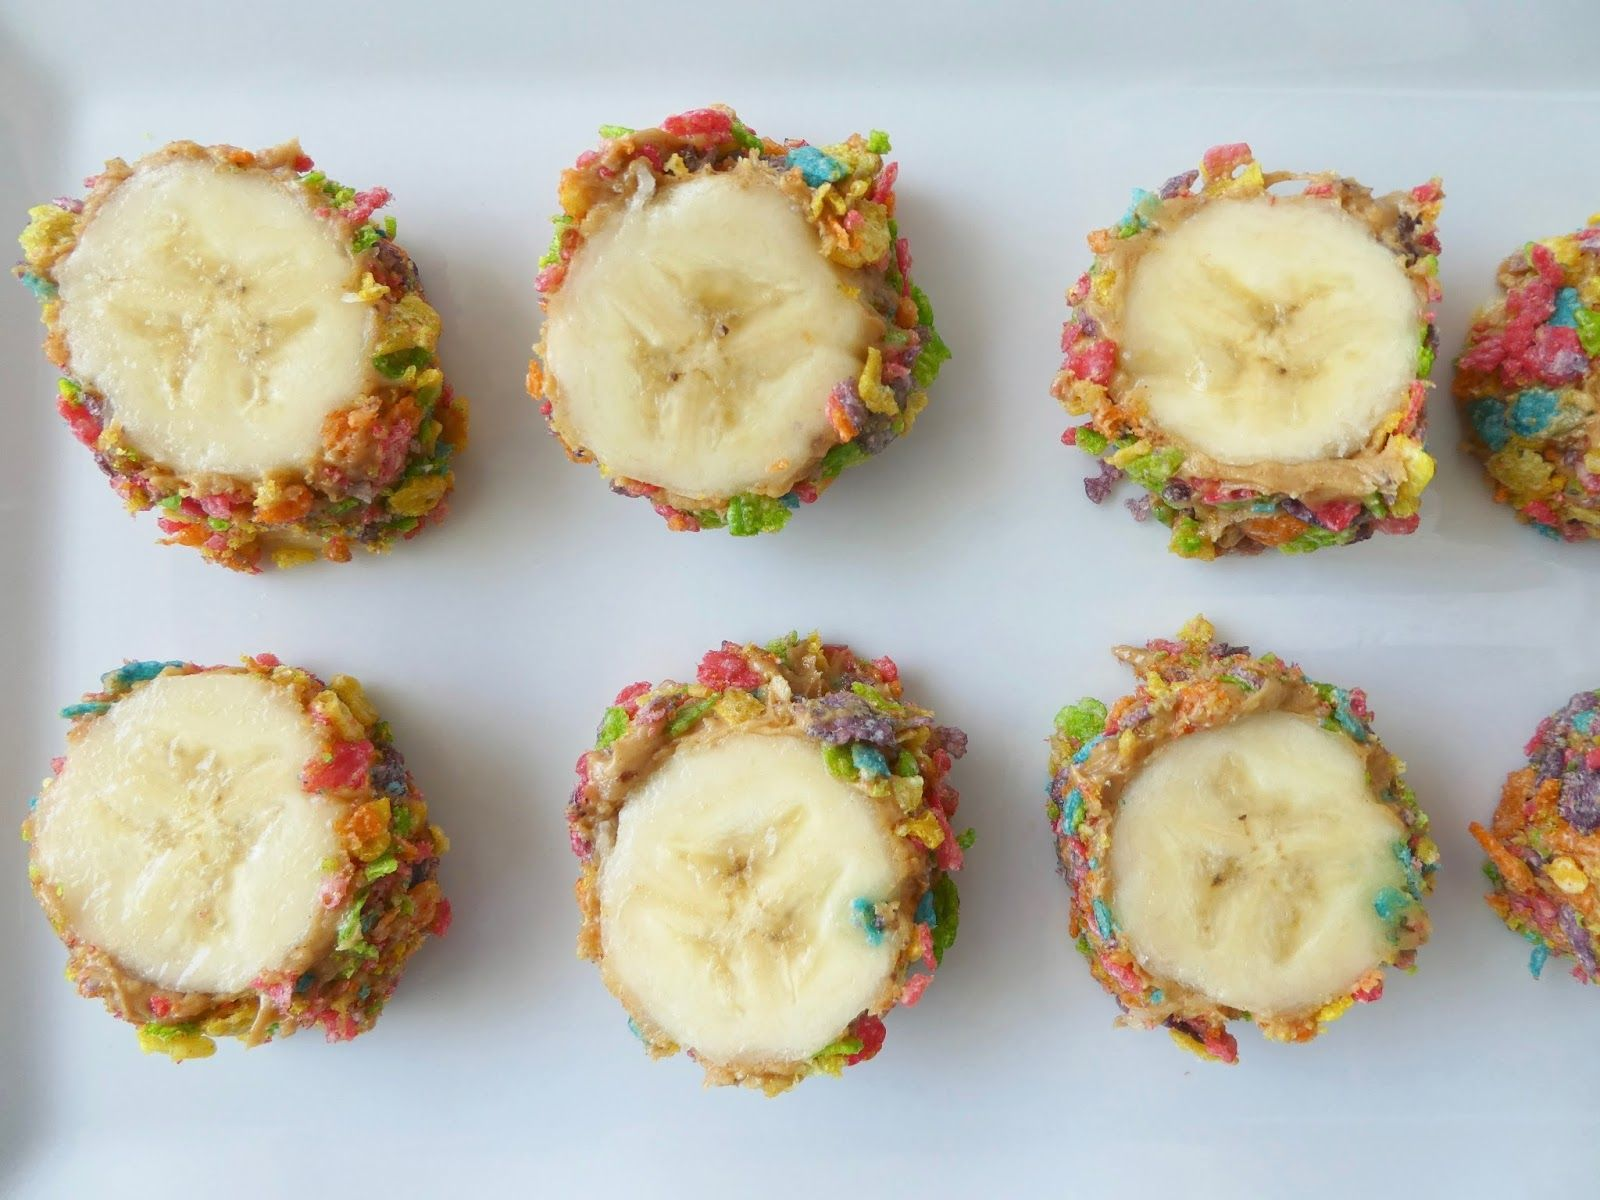 Peanut Butter and Banana Sushi - Kid's Recipe Peanut Butter and Banana Sushi - Kid's Recipe